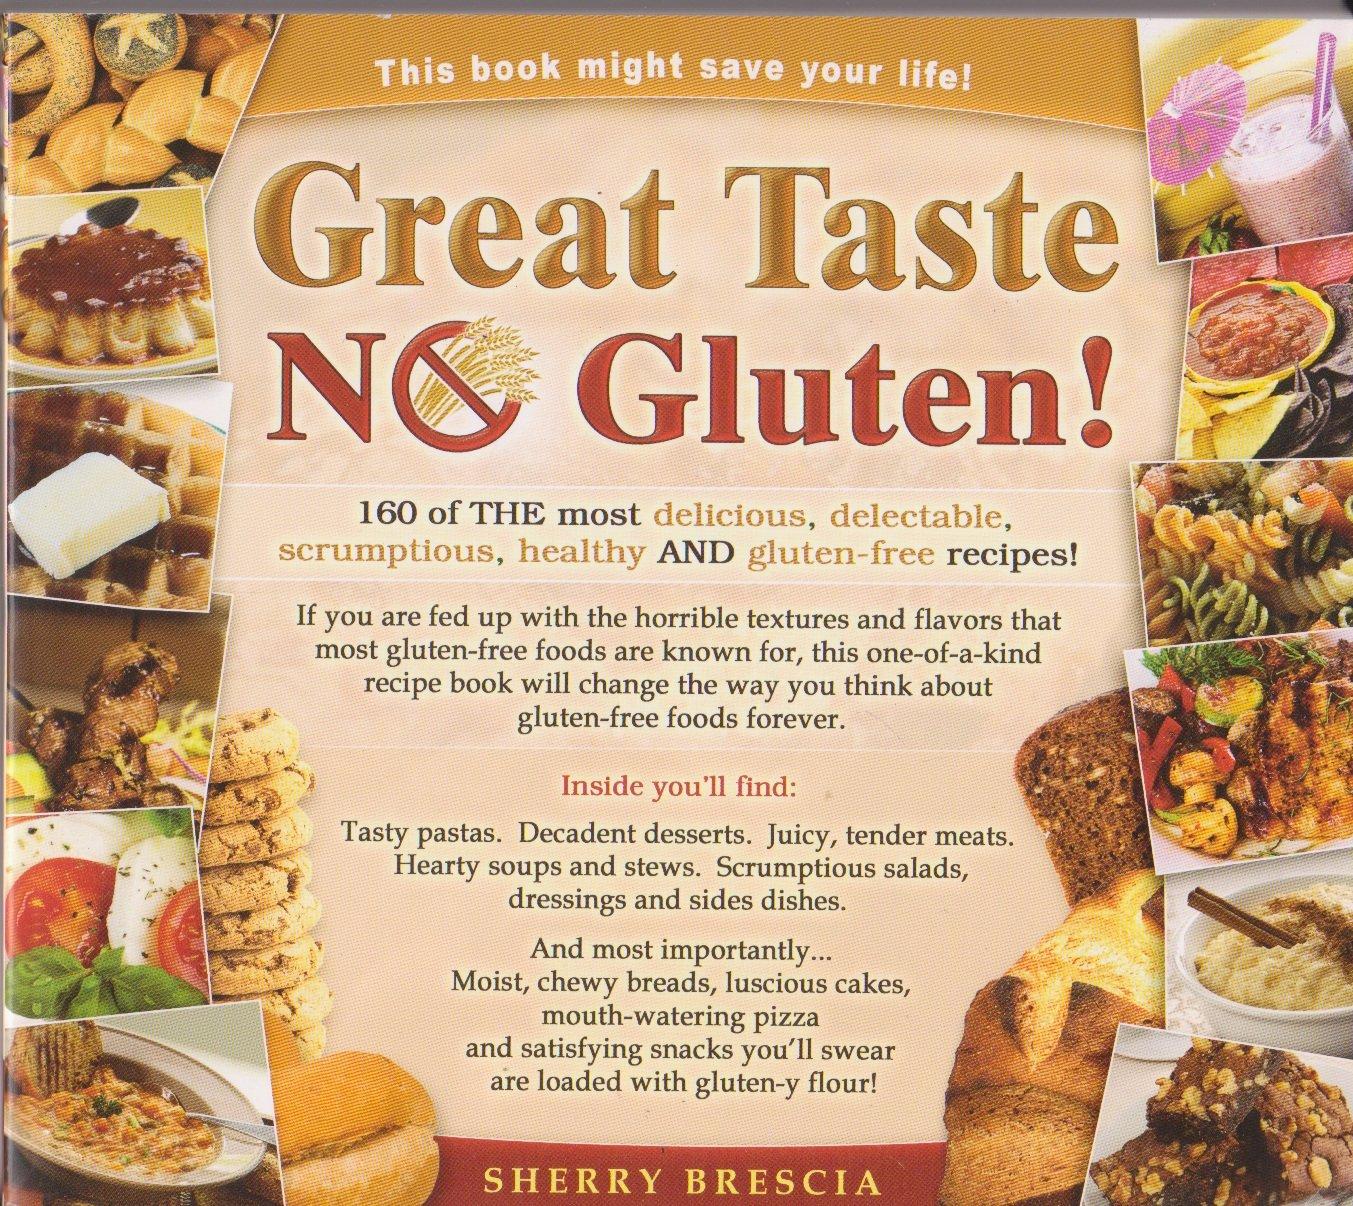 Great taste no gluten sherry brescia 9781450747066 amazon great taste no gluten sherry brescia 9781450747066 amazon books forumfinder Gallery